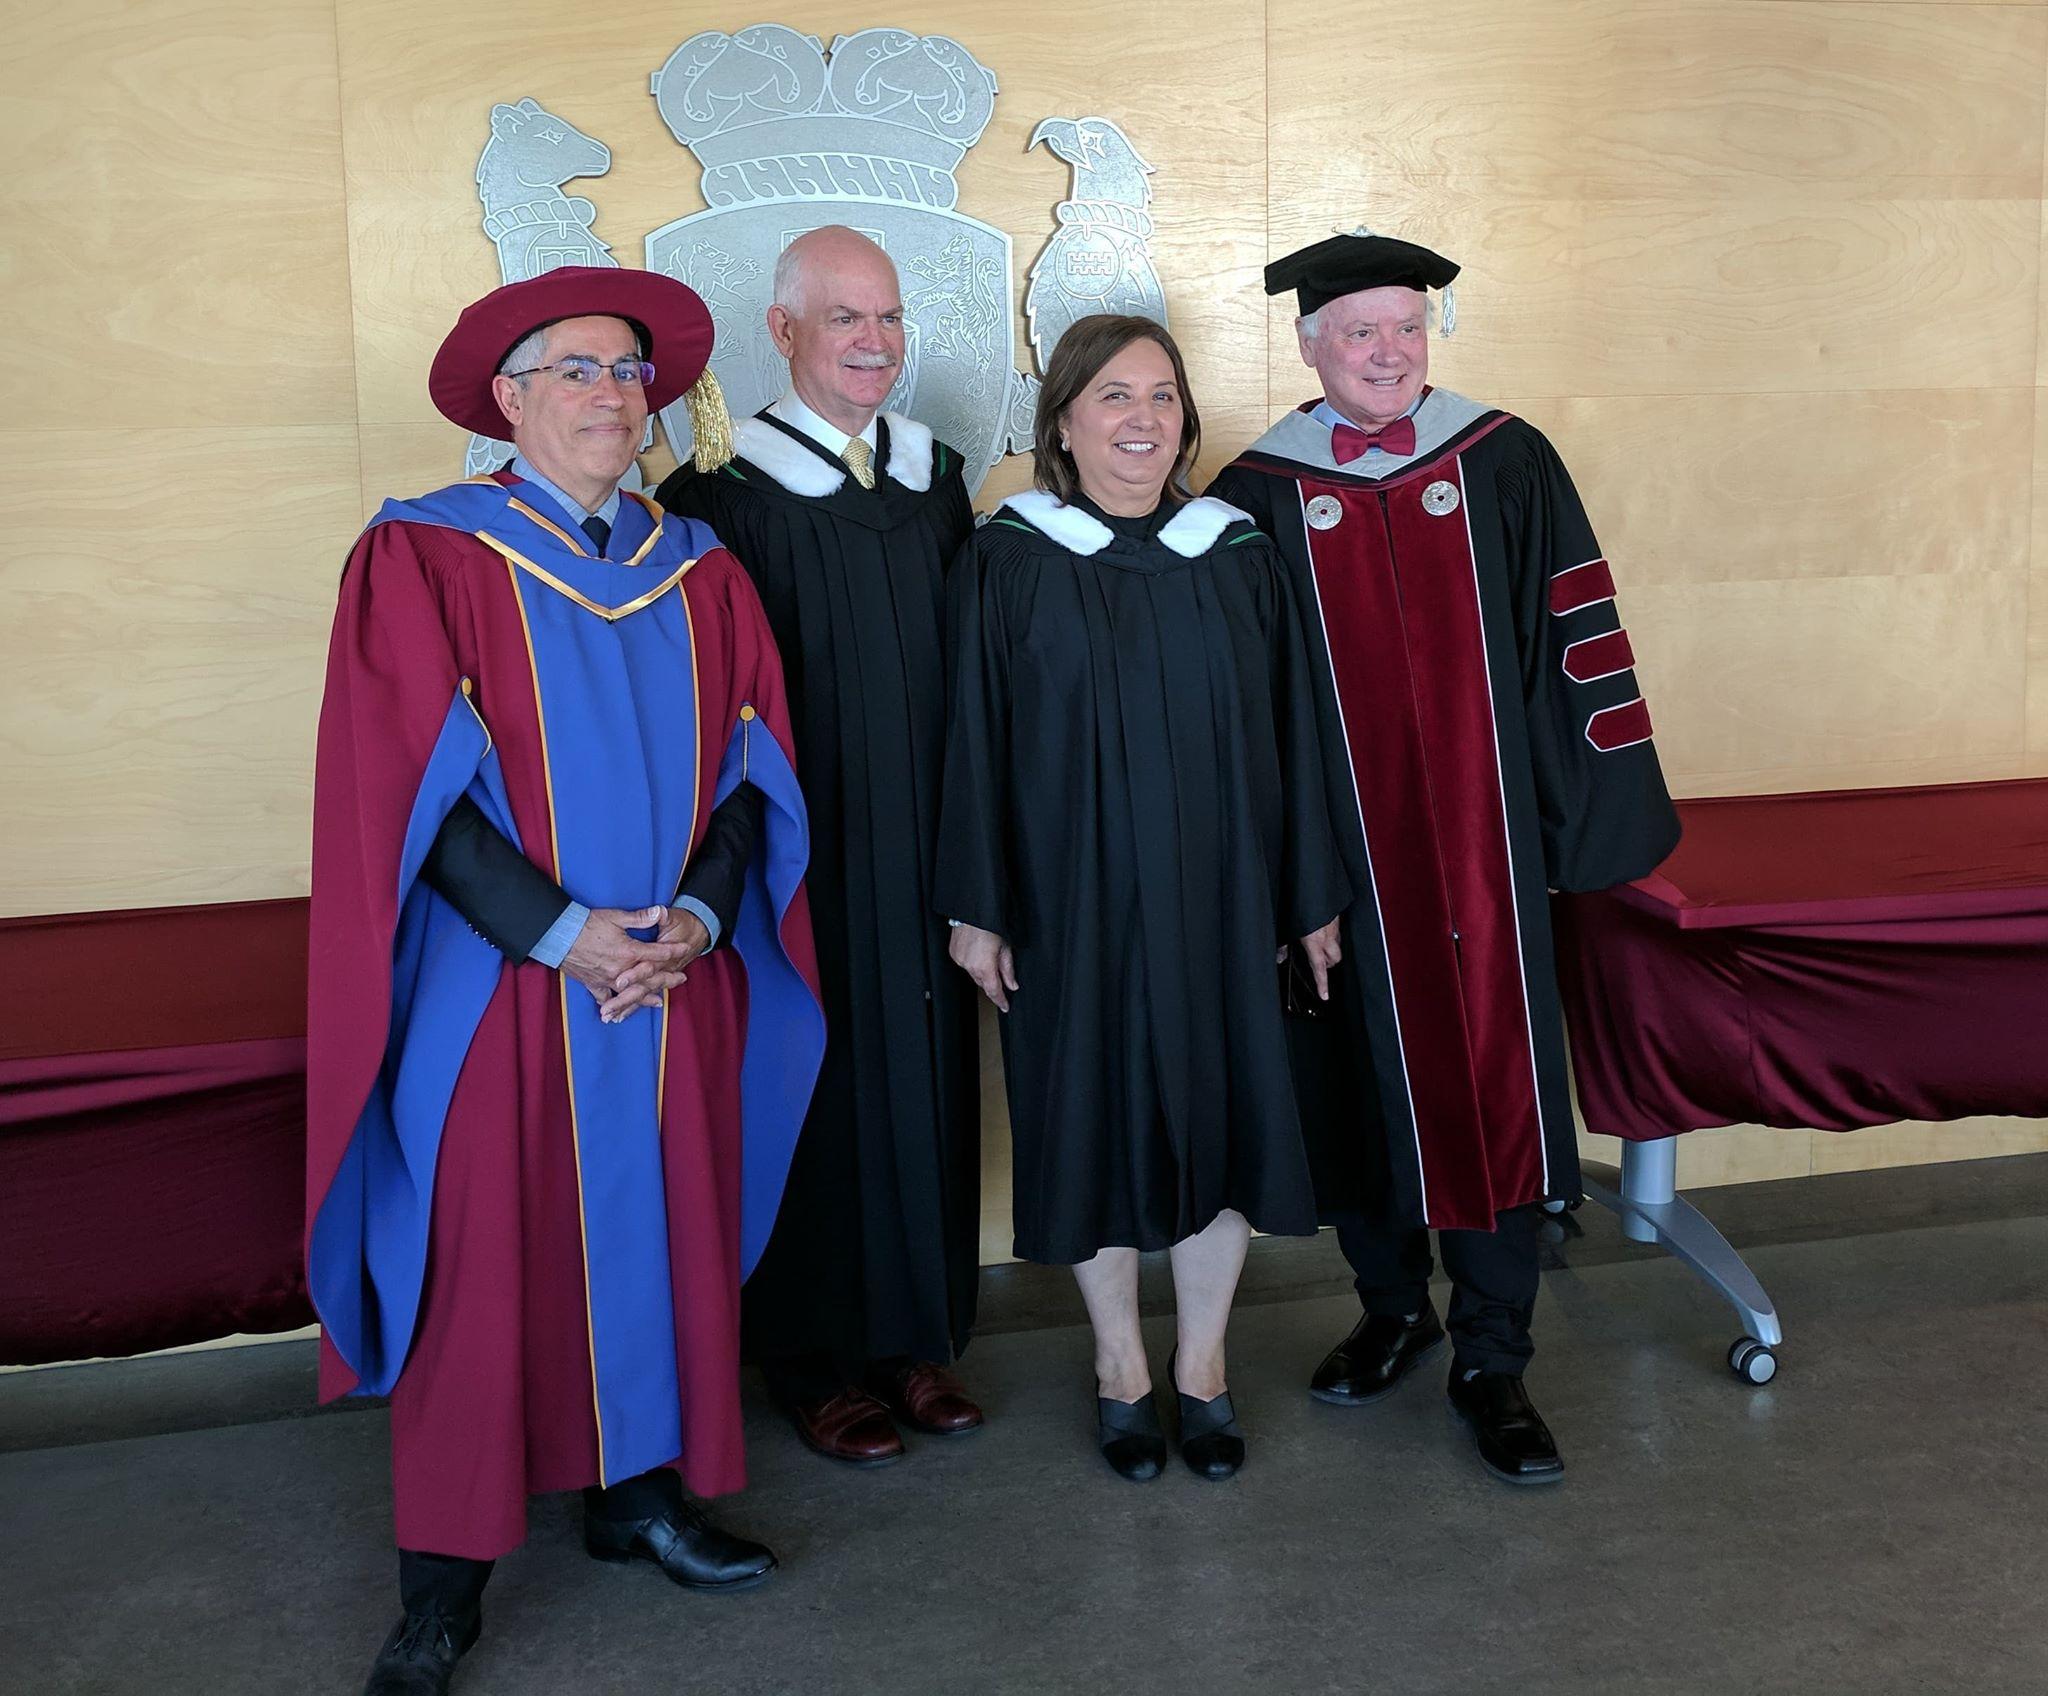 Several Surrey MLAs in academic regalia at KPU's spring convocation ceremony at KPU Surrey campus on Friday, June 1, 201